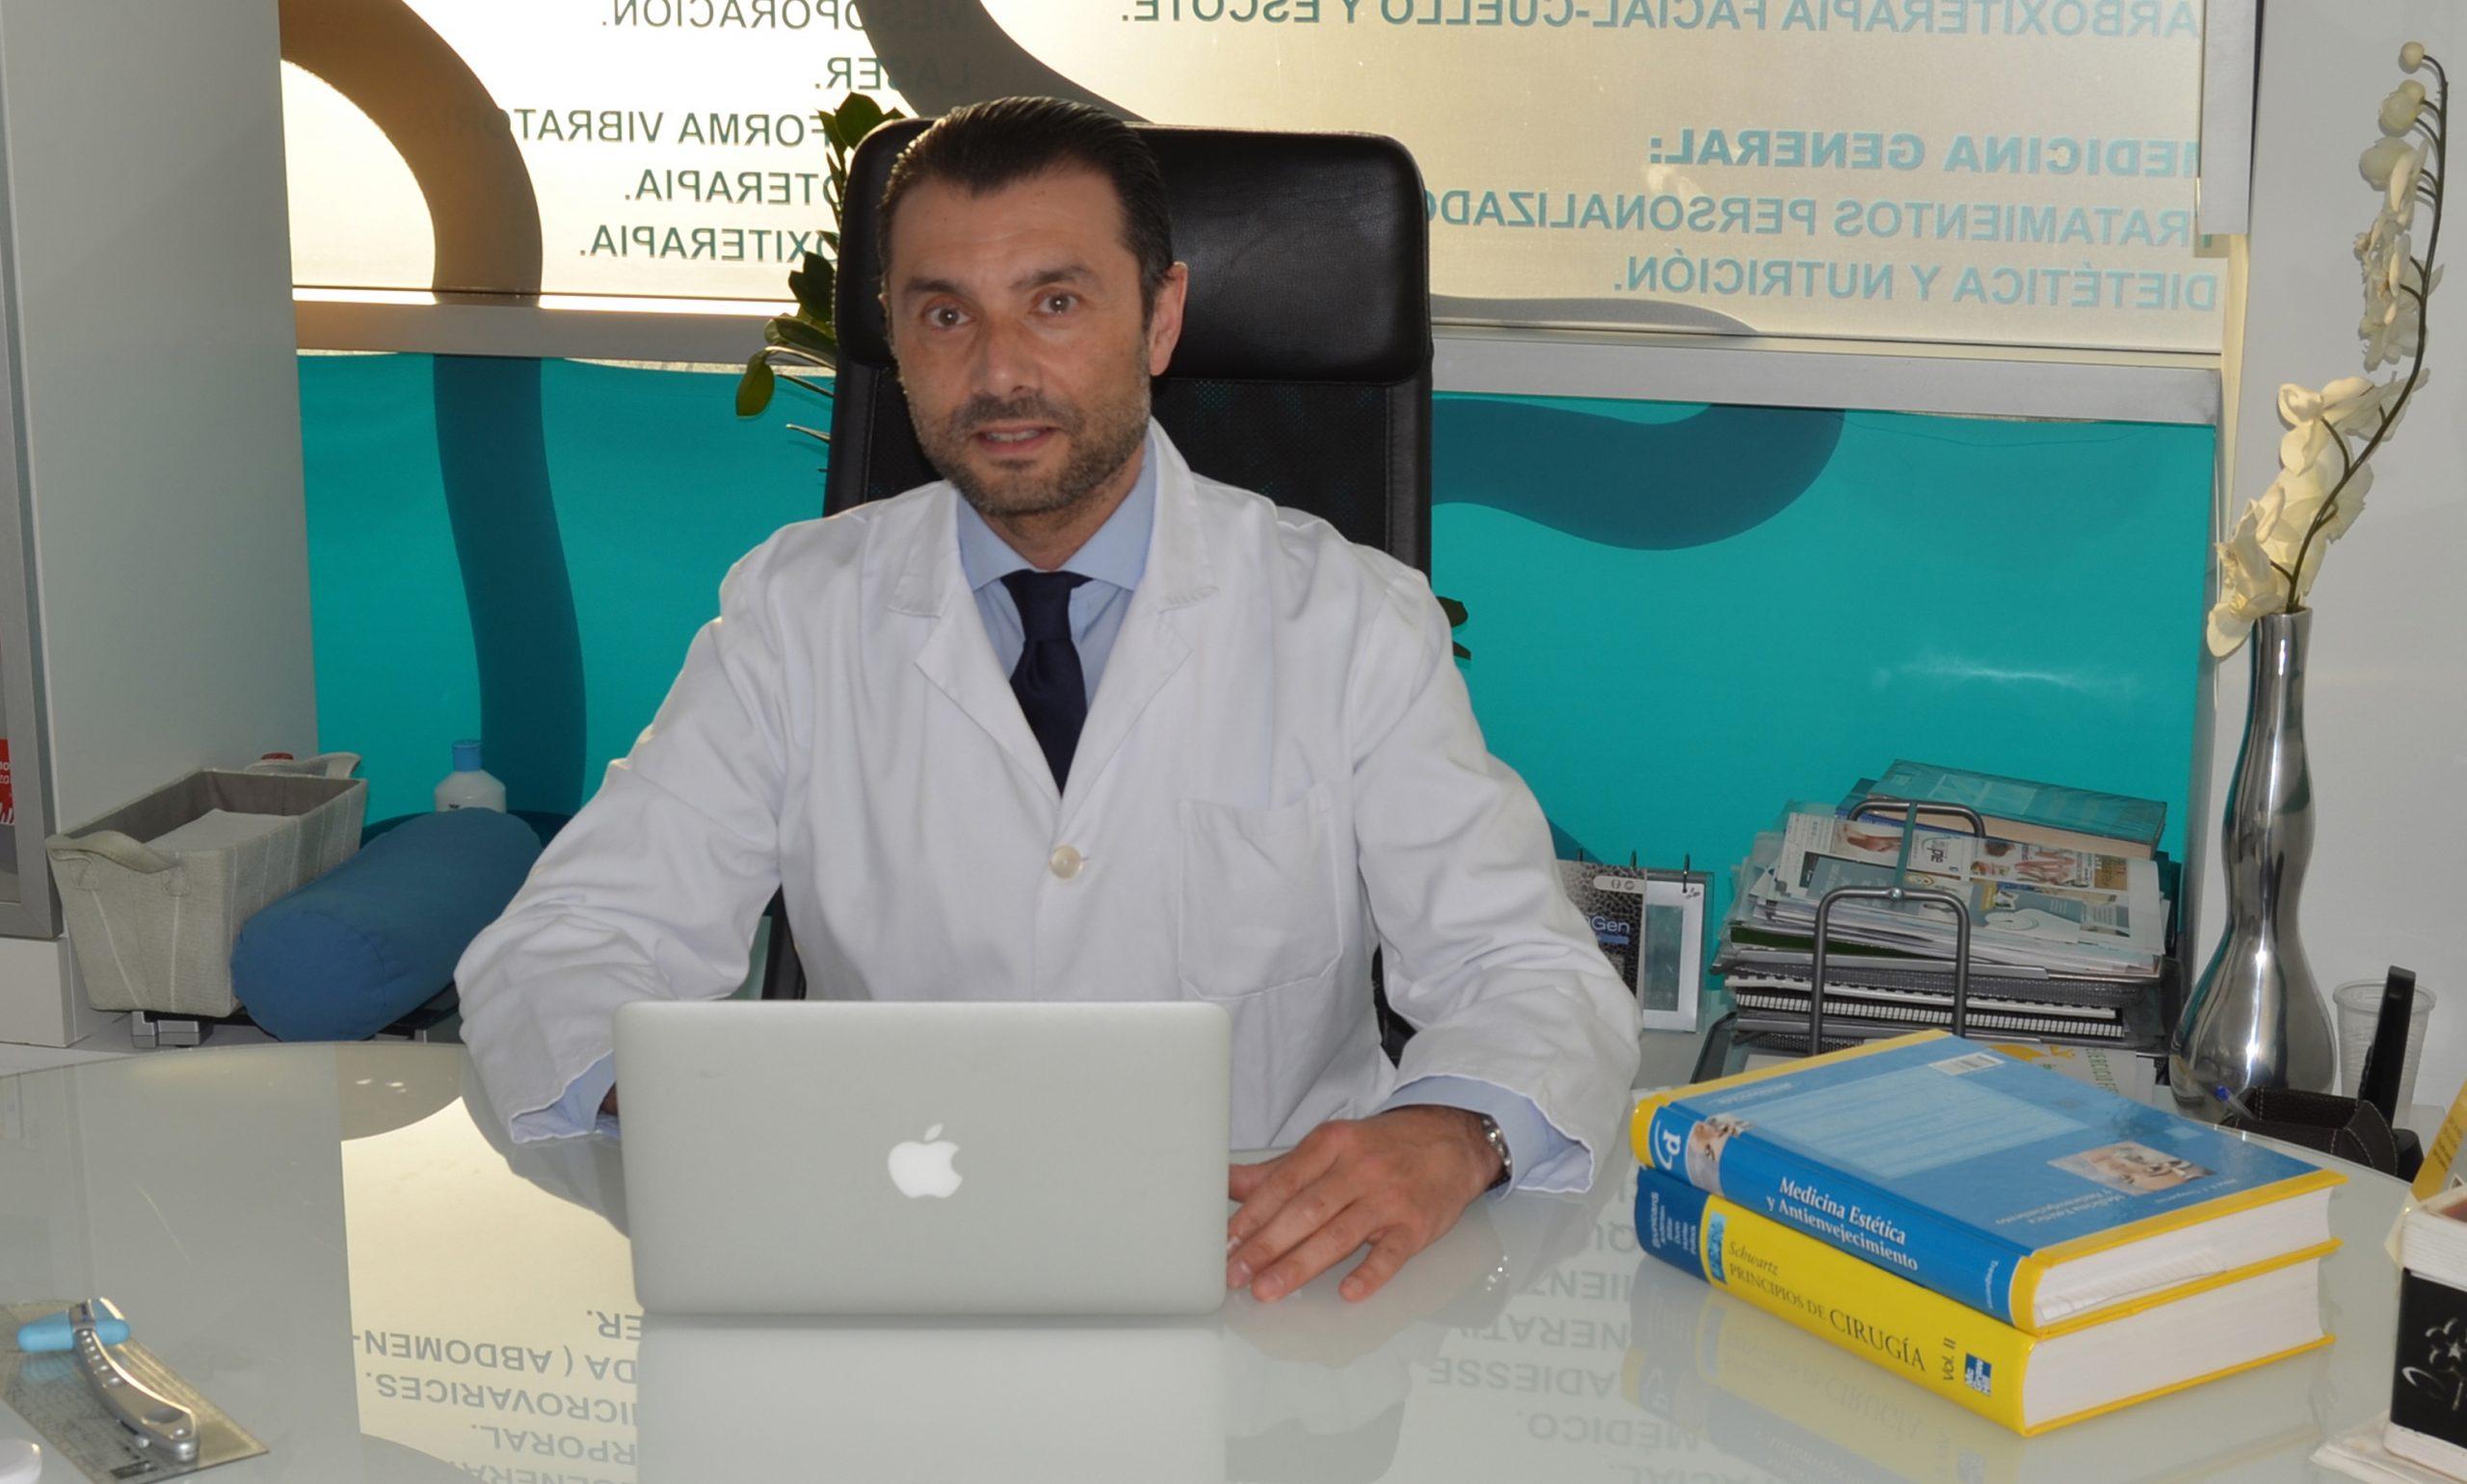 Doctor Álvarez Medicina Estética